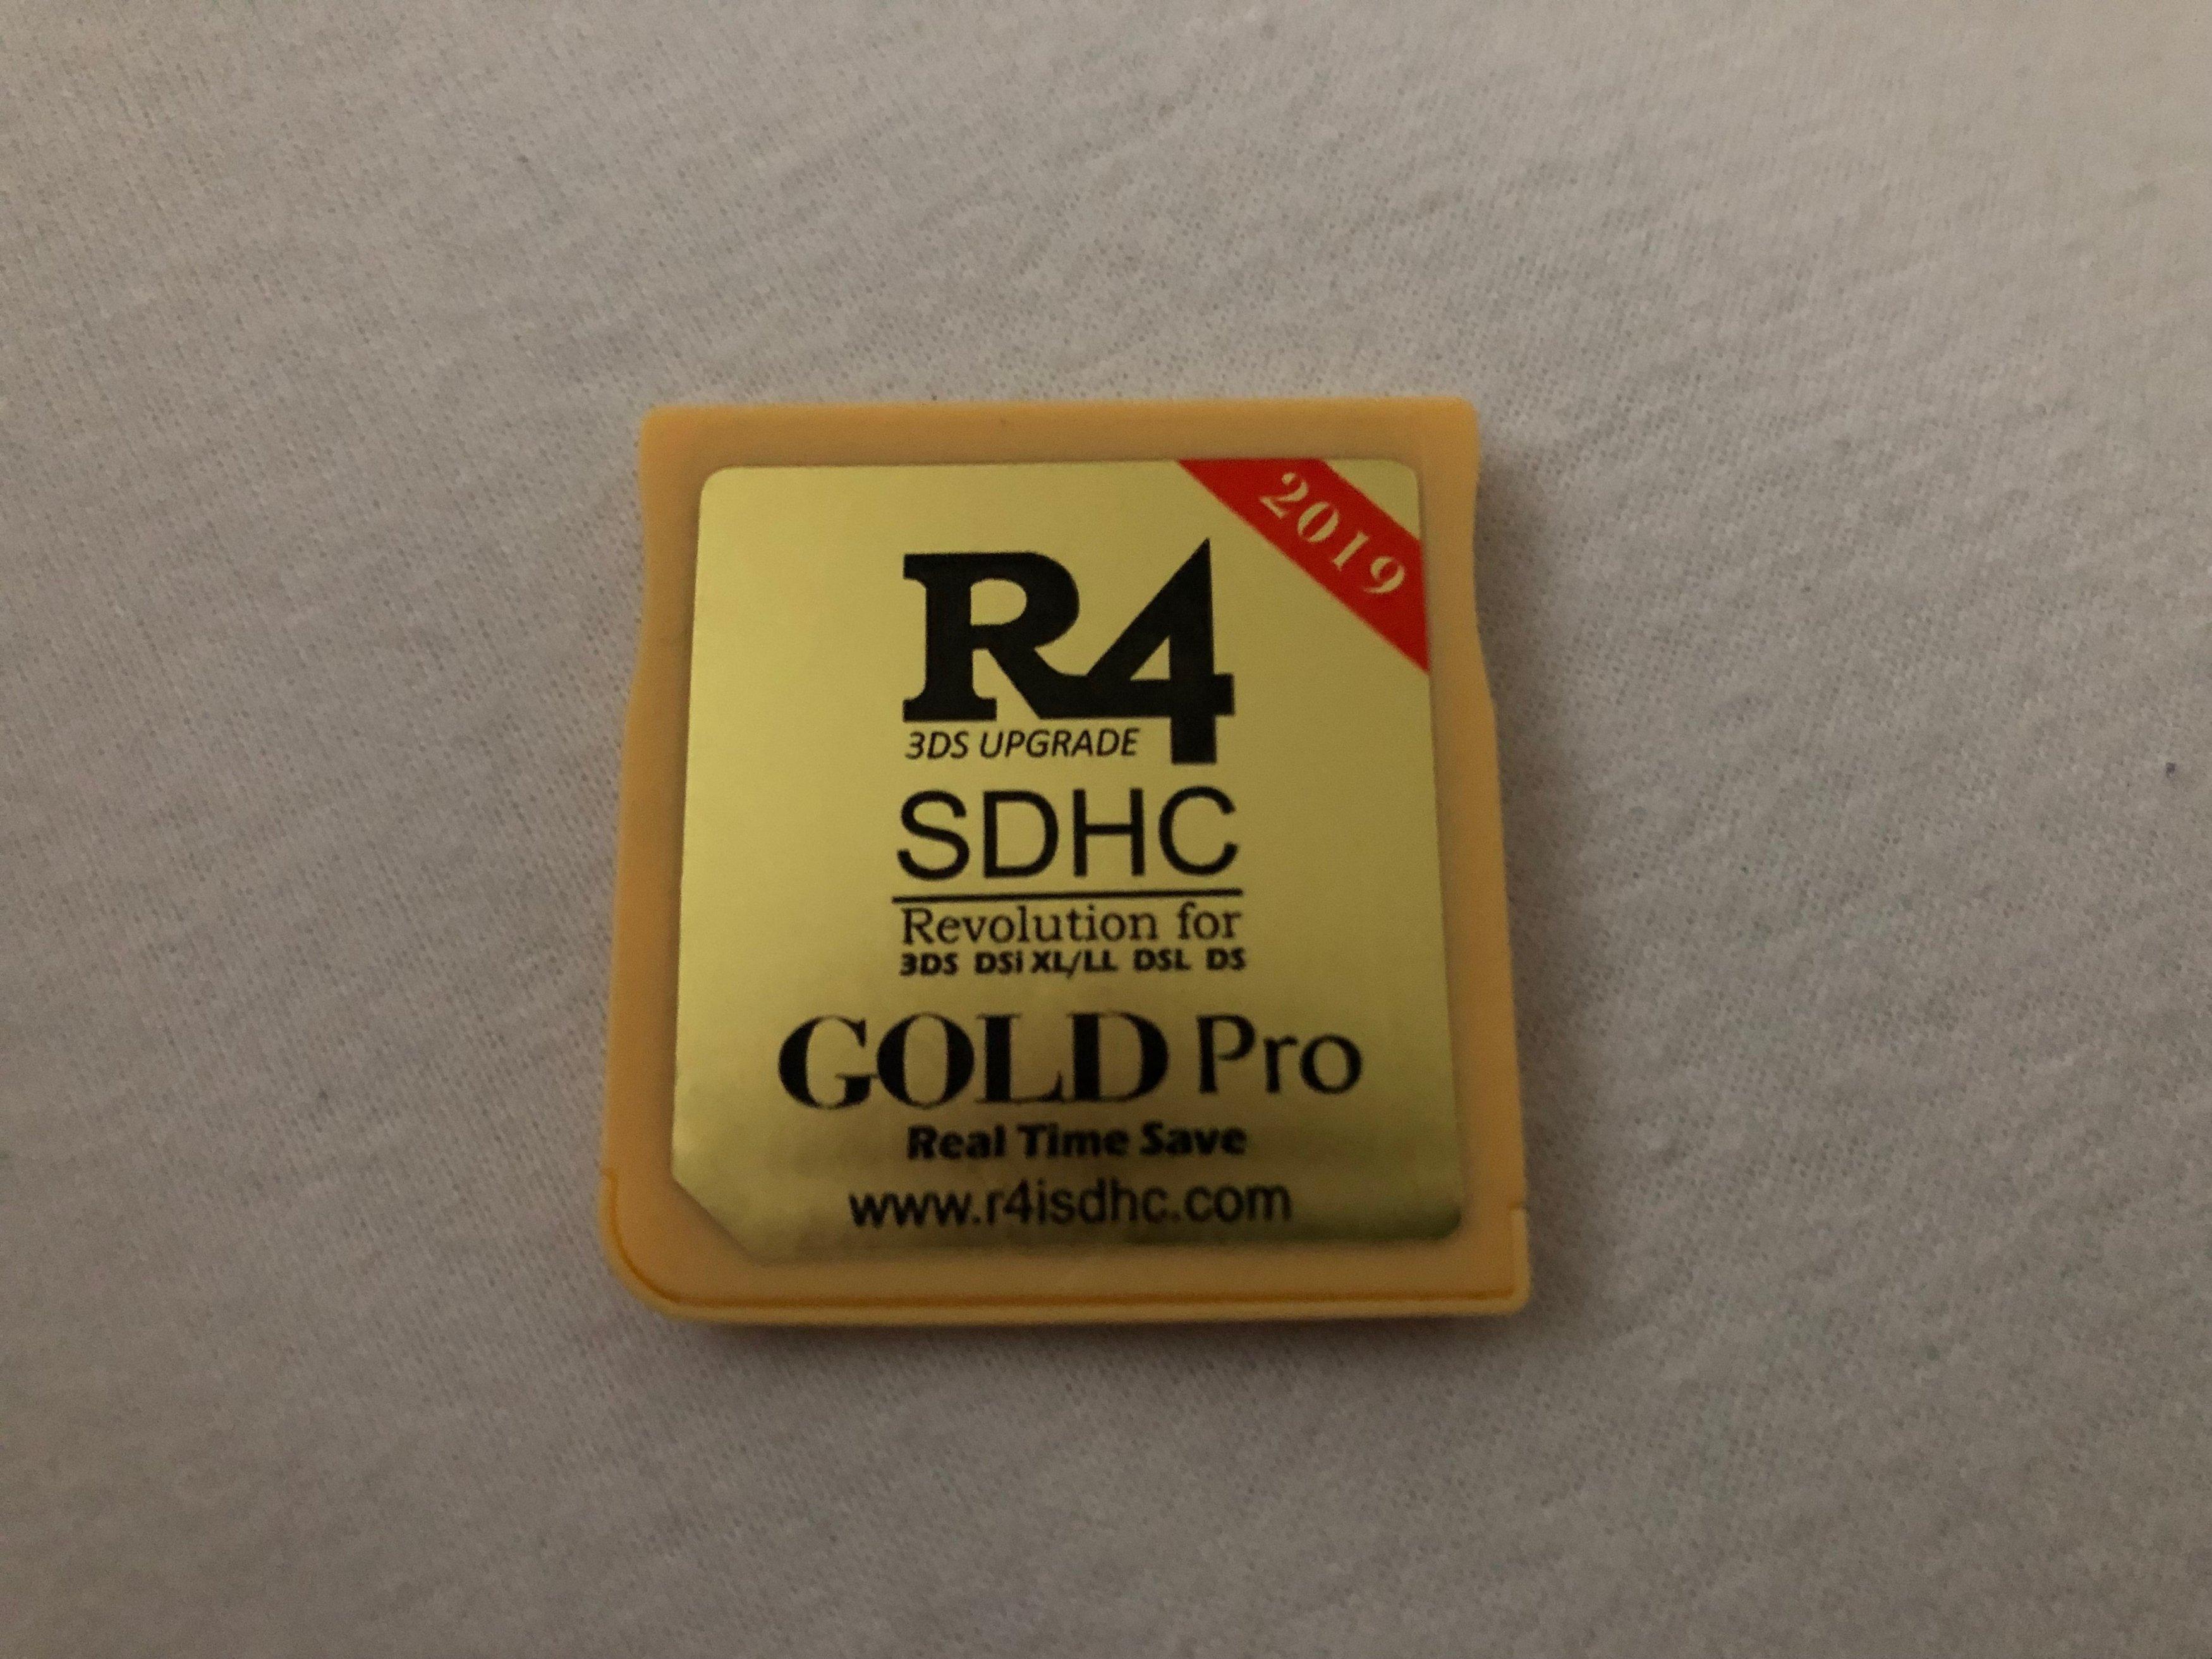 R4i Pro 2019 VS R4 (non-SDHC) - Very slow  Better Firmware